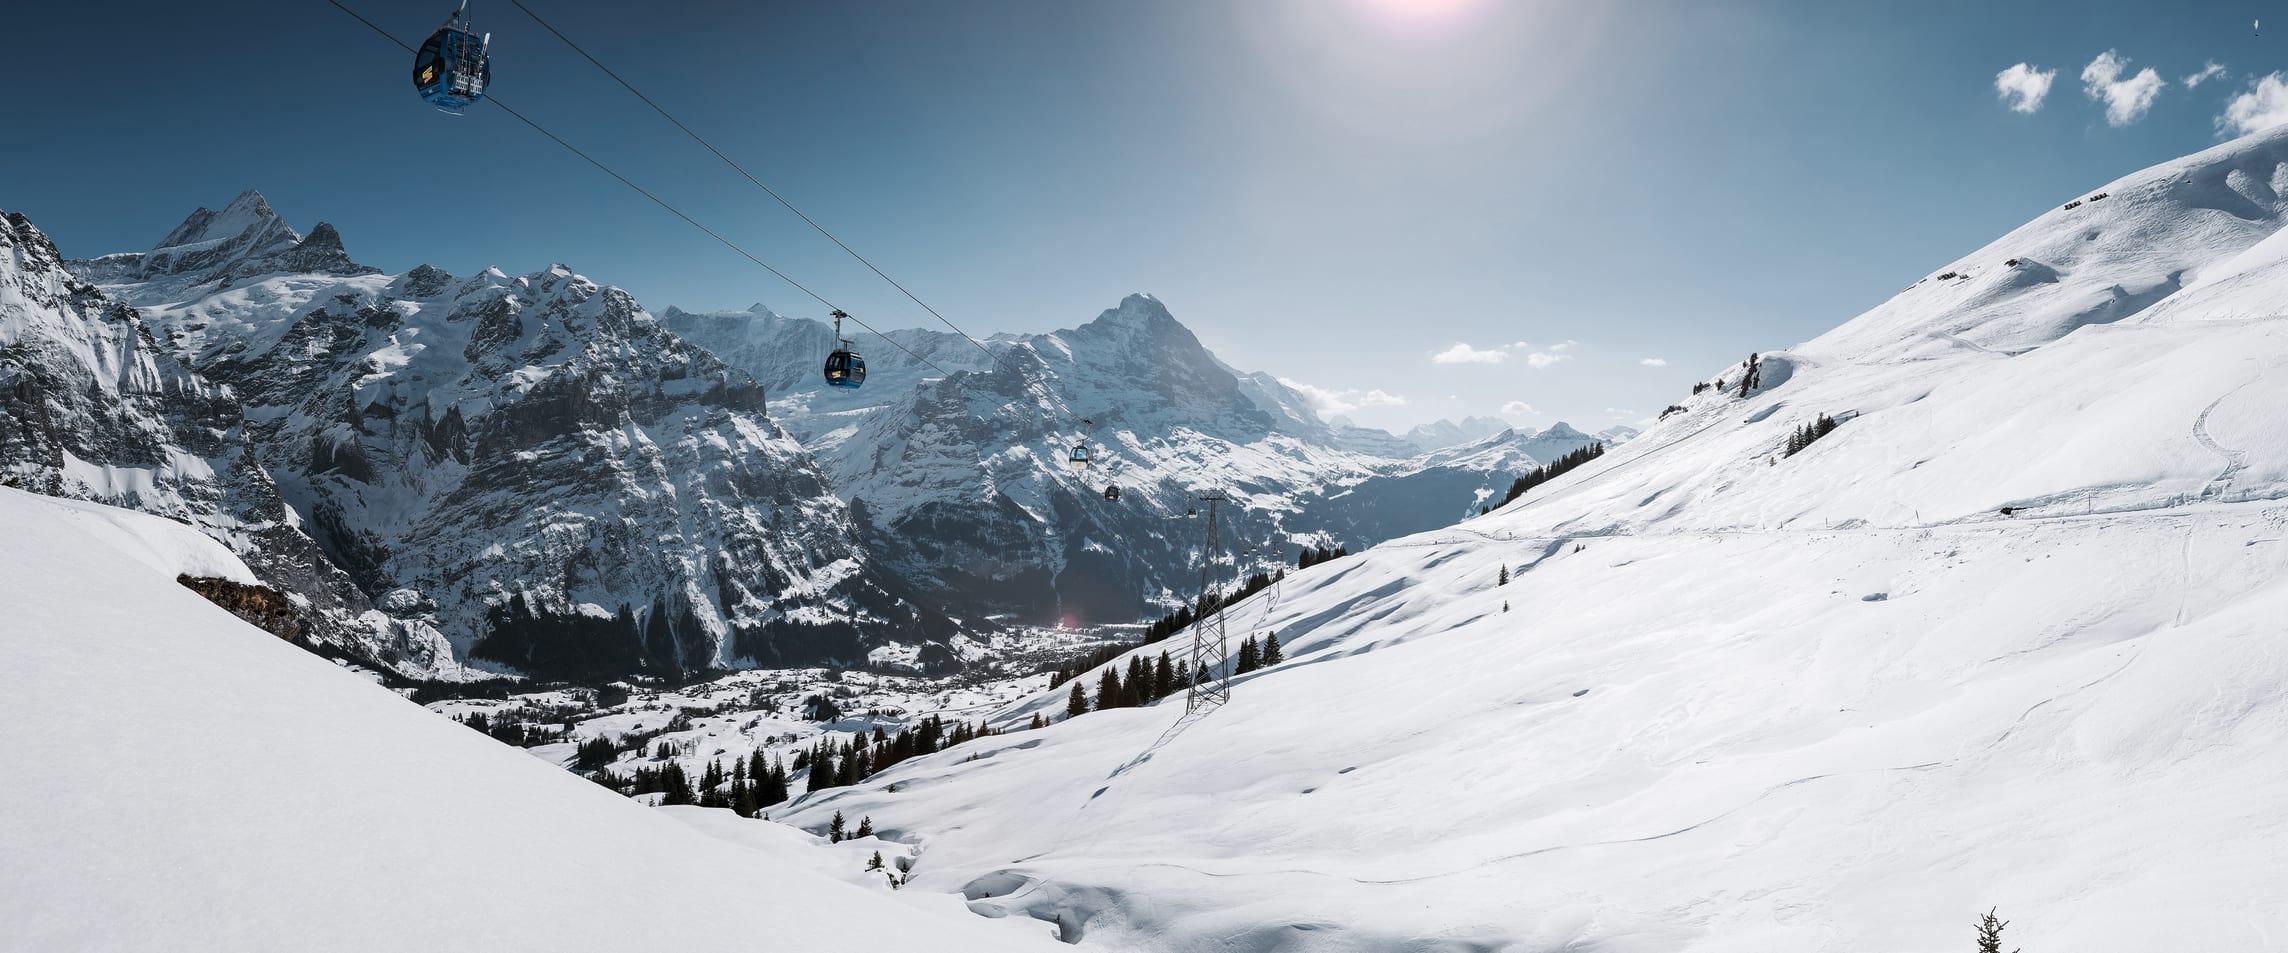 Jungfrau firstbahn eiger grindelwald first